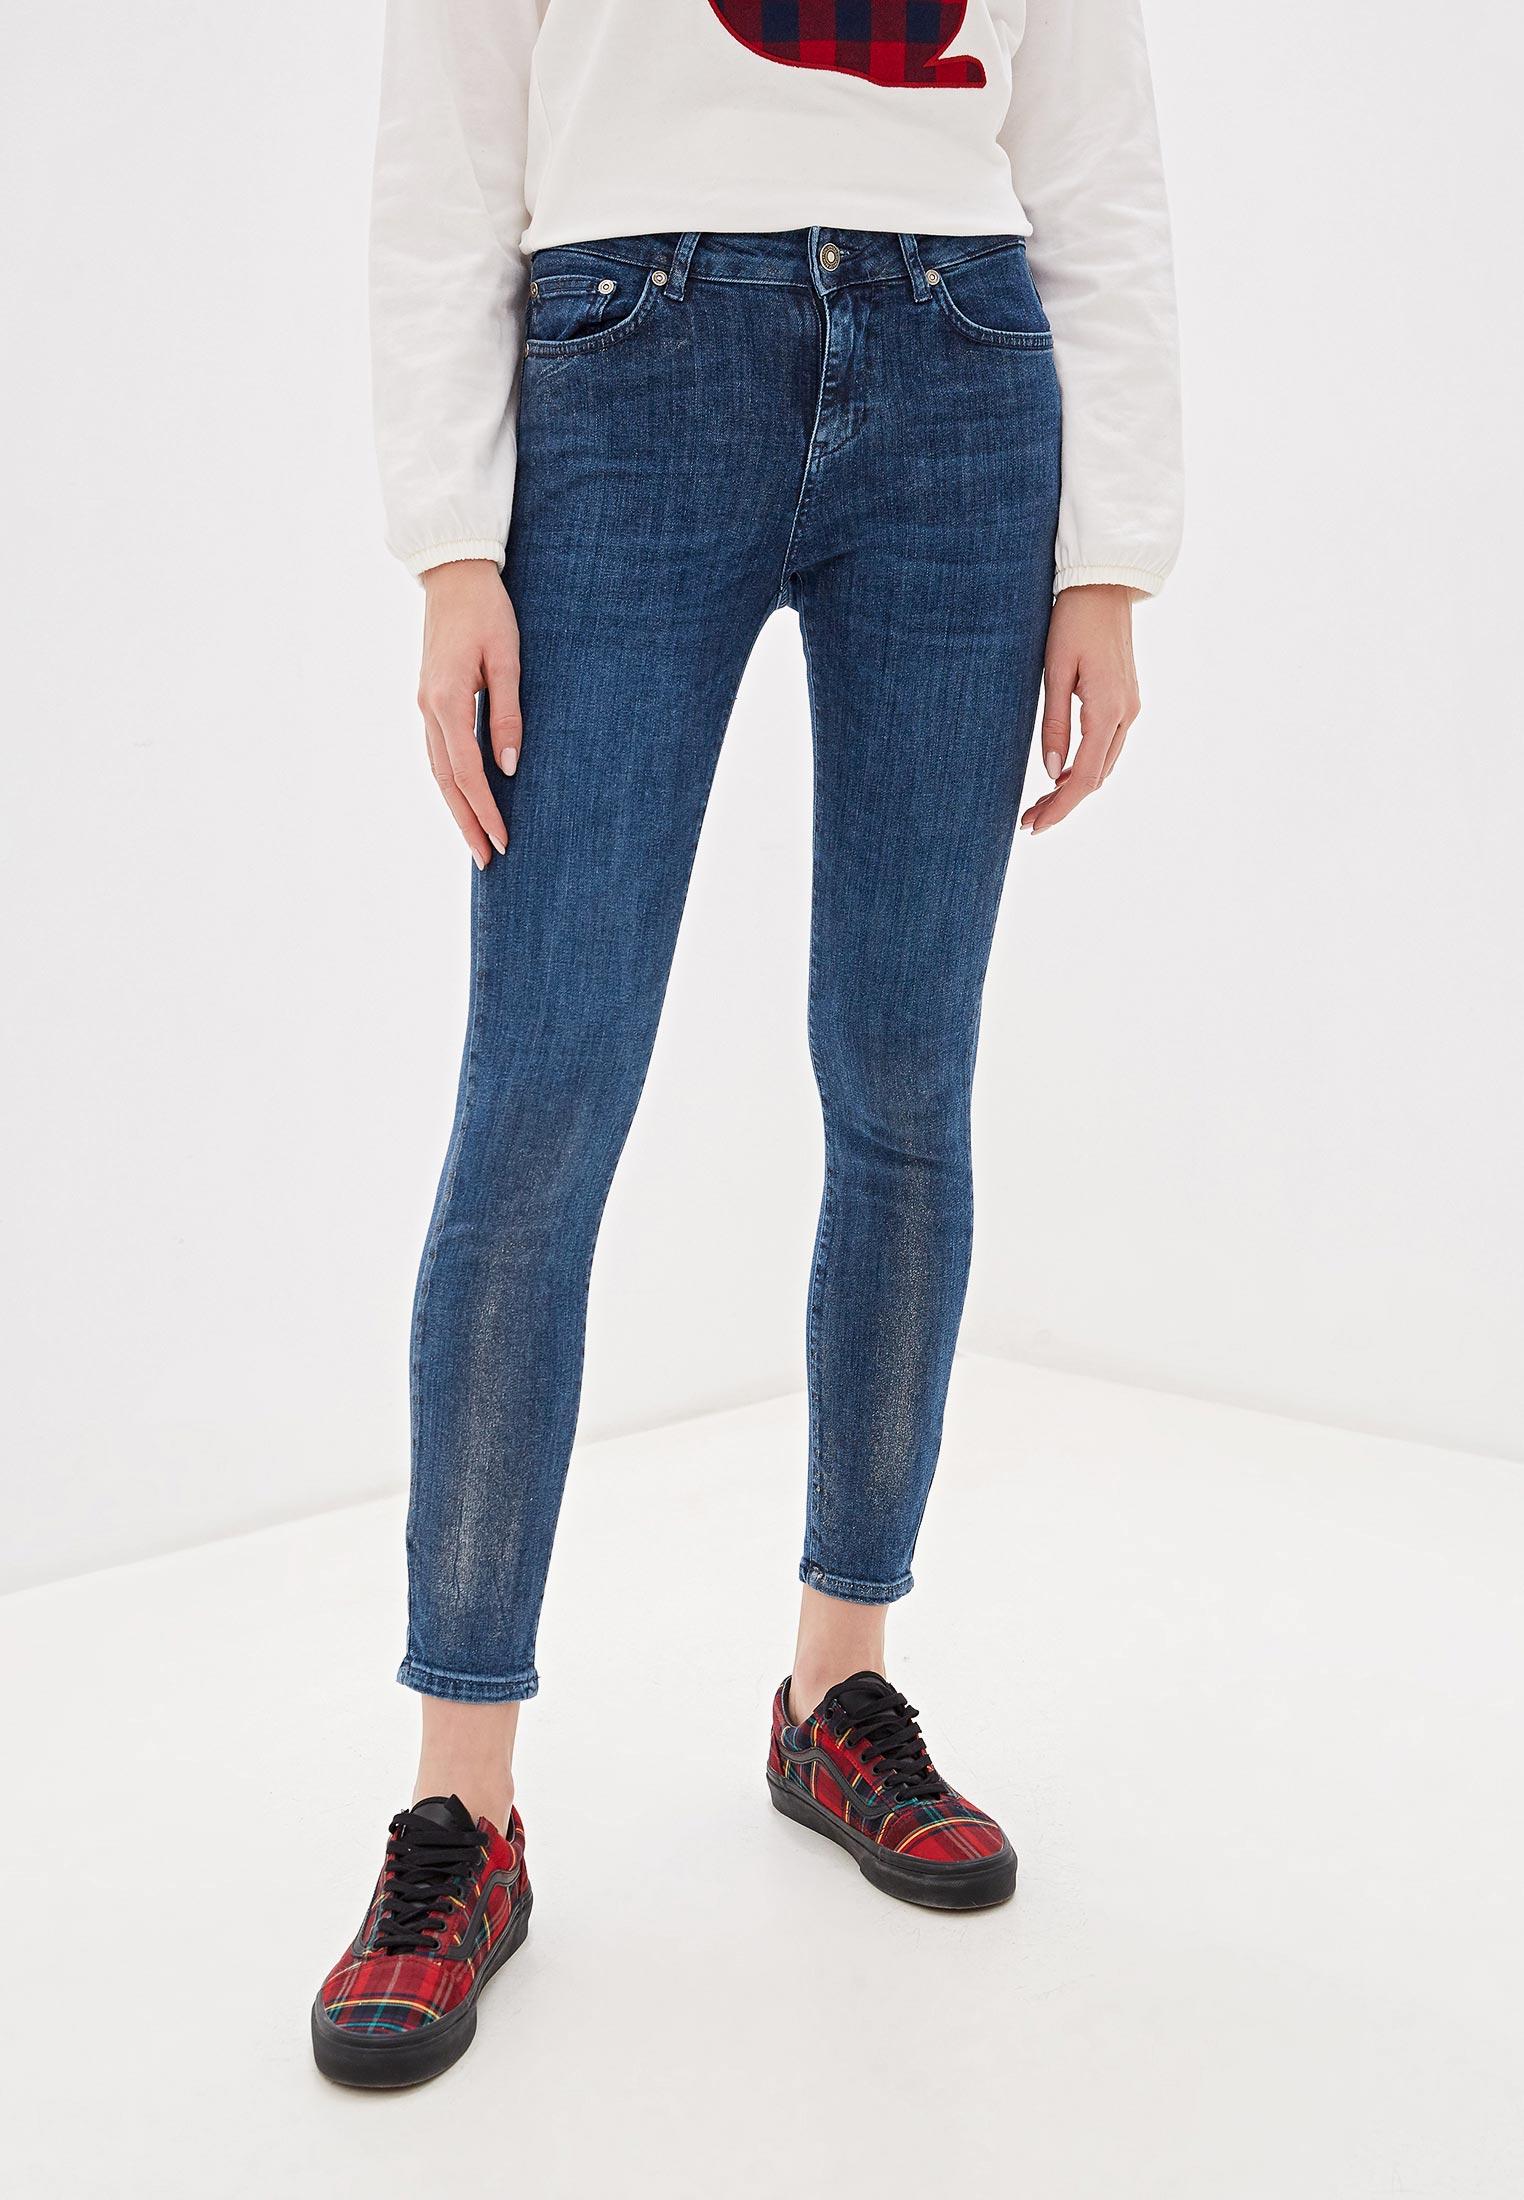 Зауженные джинсы United Colors of Benetton (Юнайтед Колорс оф Бенеттон) 4YK0574L4